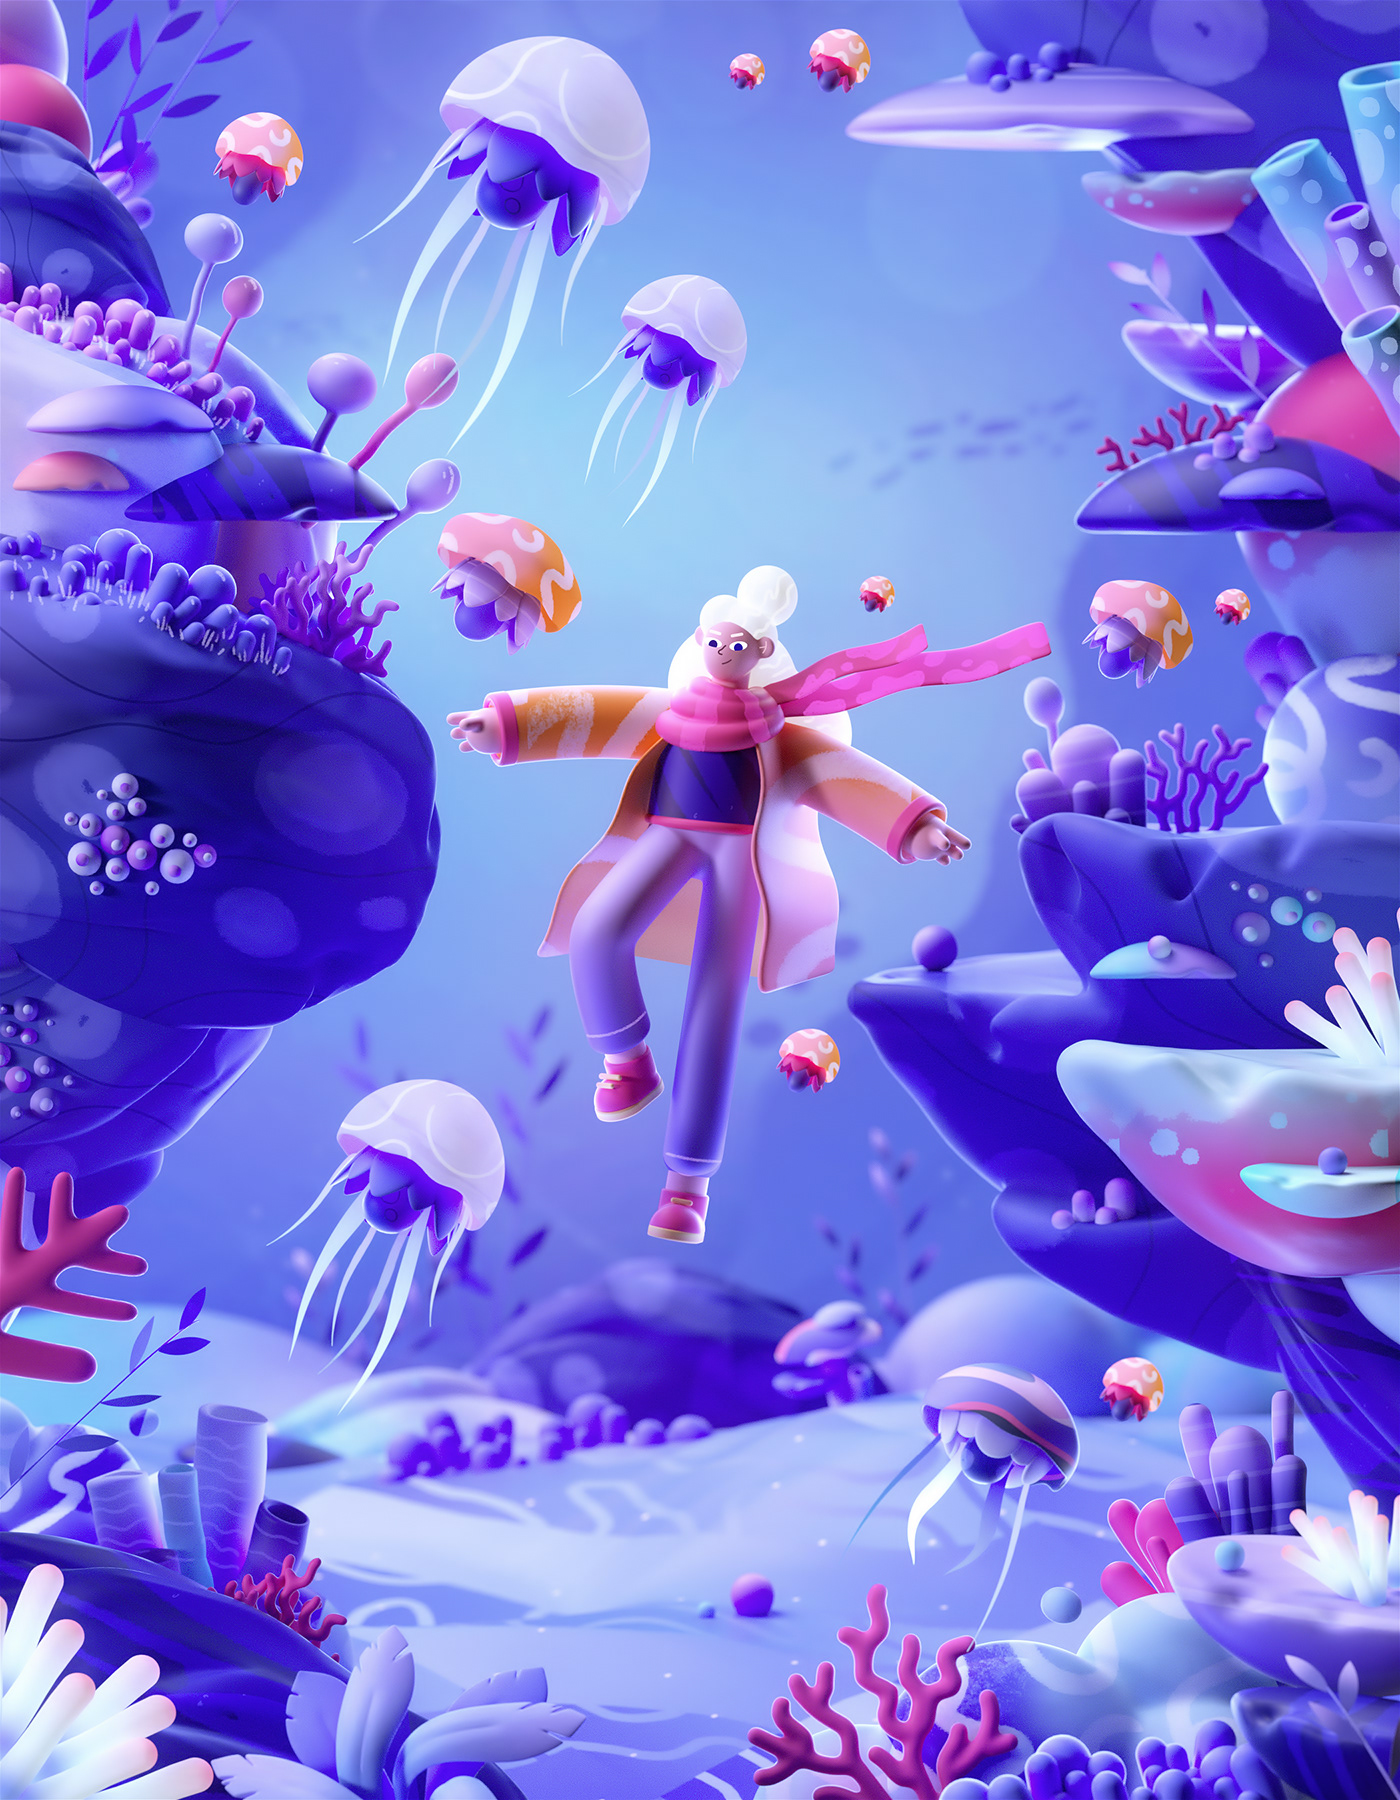 2D 3D abstract art colors design ILLUSTRATION  dark Space